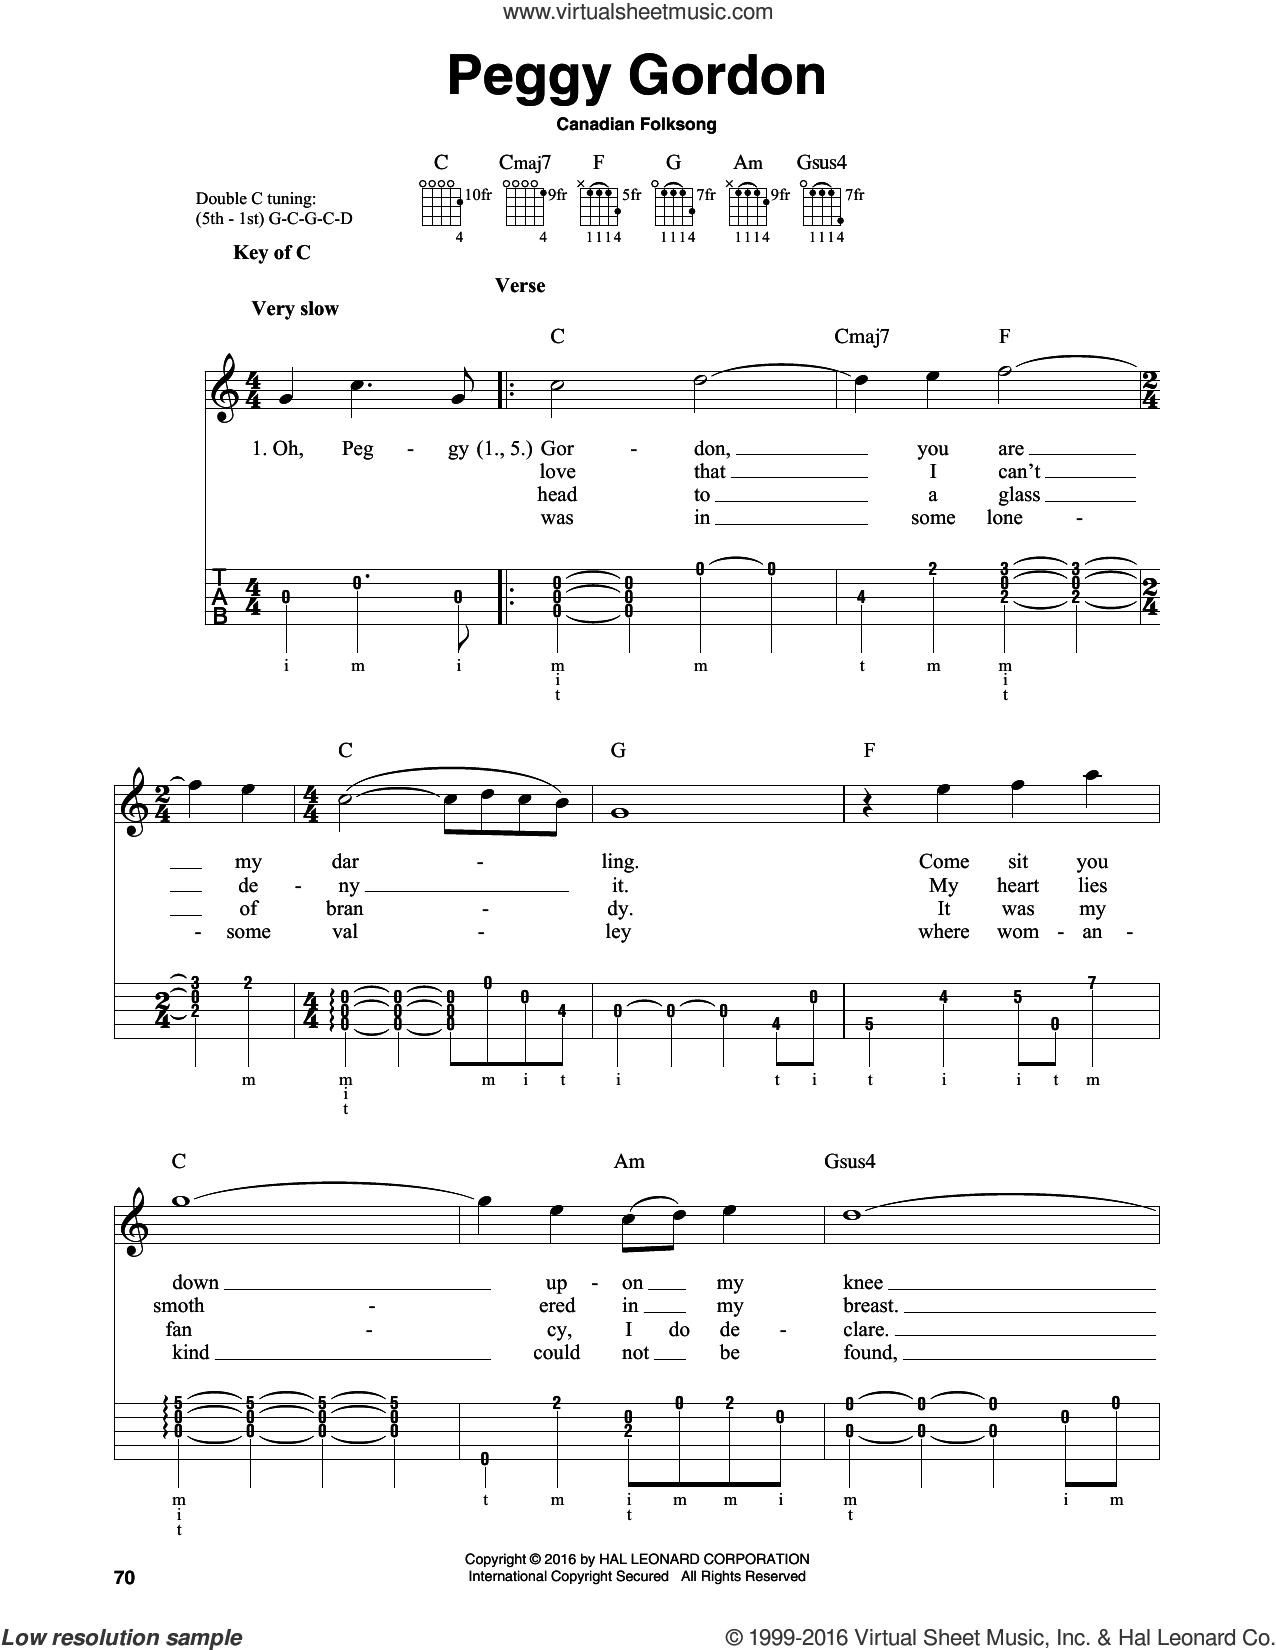 Peggy Gordon sheet music for banjo solo by Canadian Folk Song, intermediate skill level